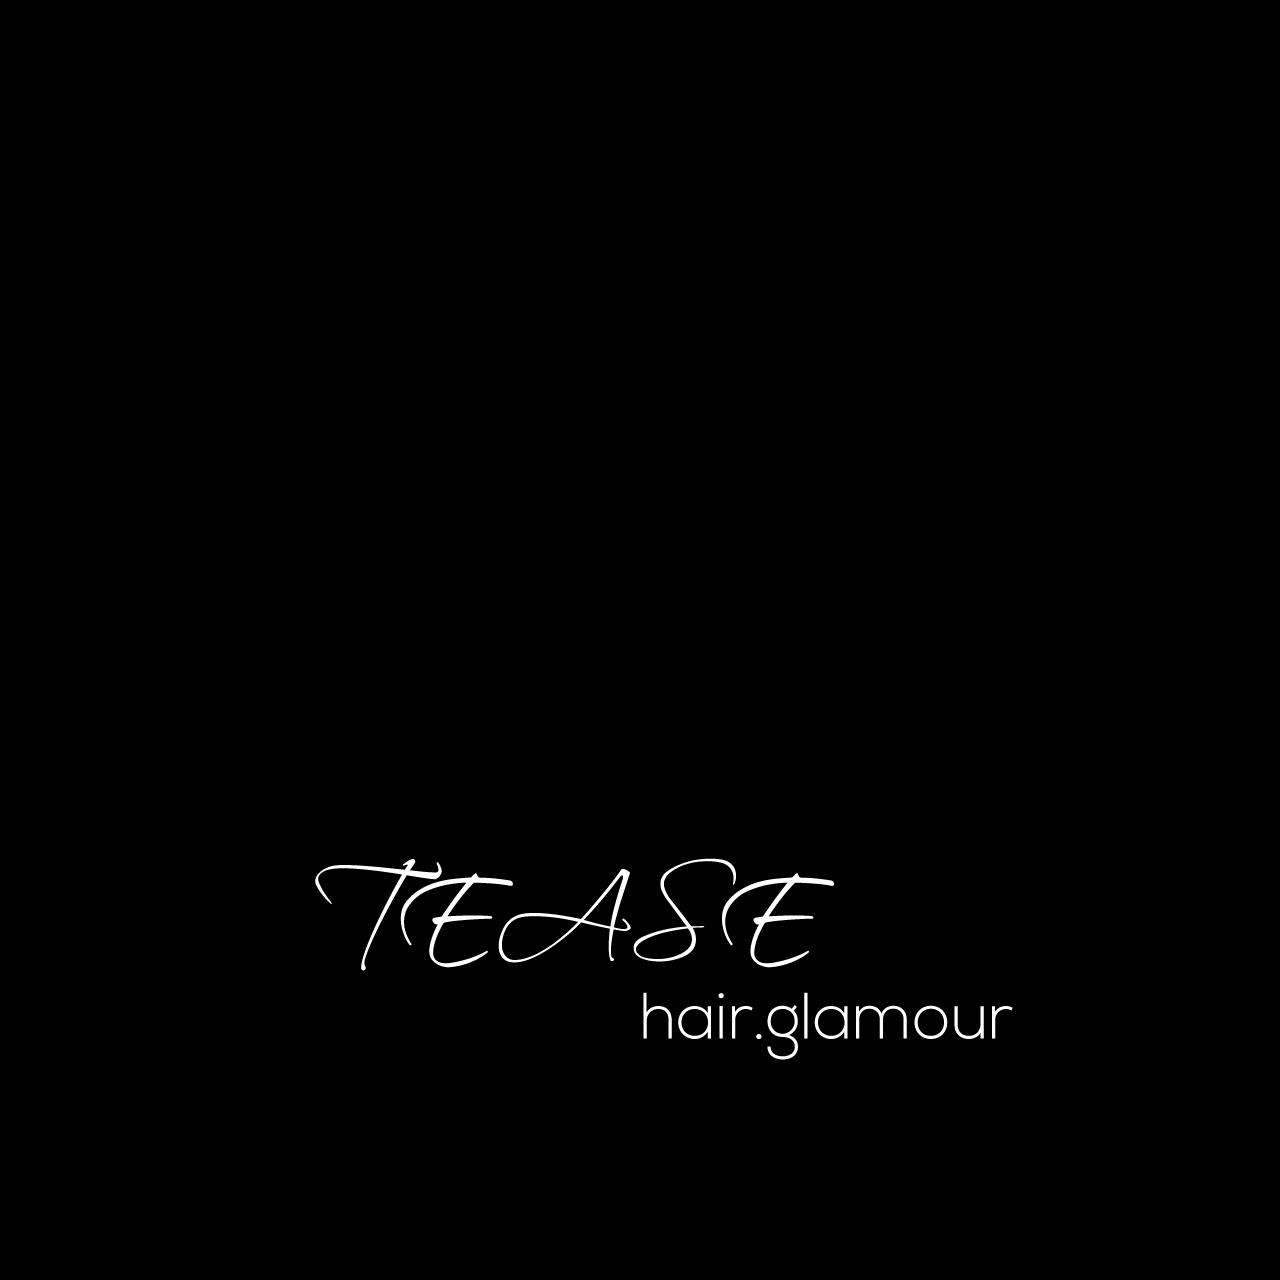 upmarket professional hair logo design for tease hair glamour by